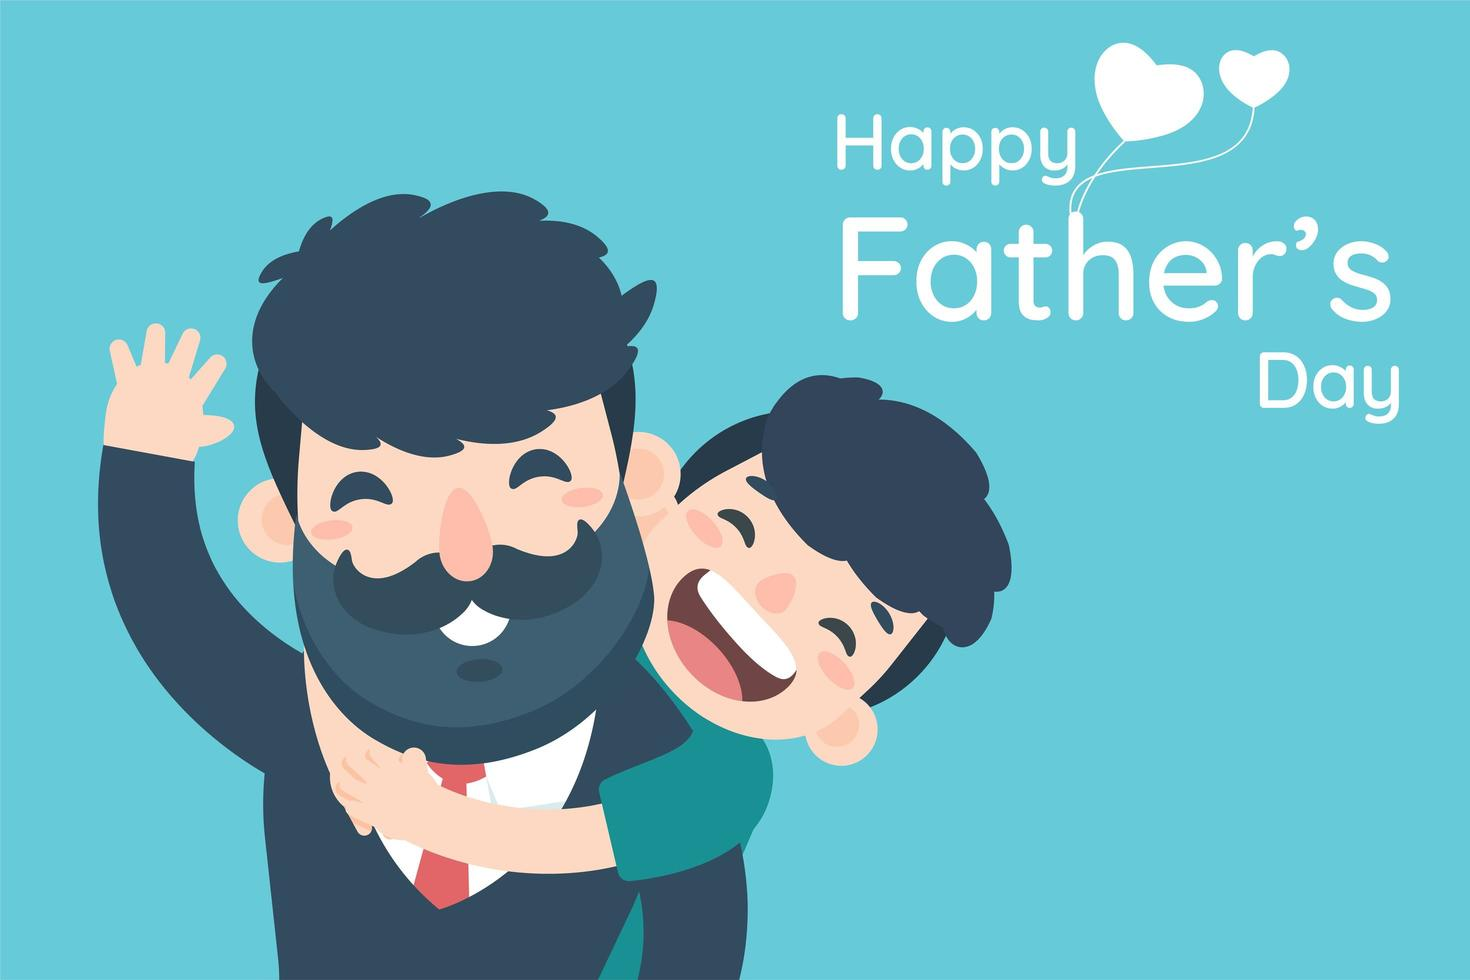 feliz día del padre con niño abrazando a papá desde atrás vector